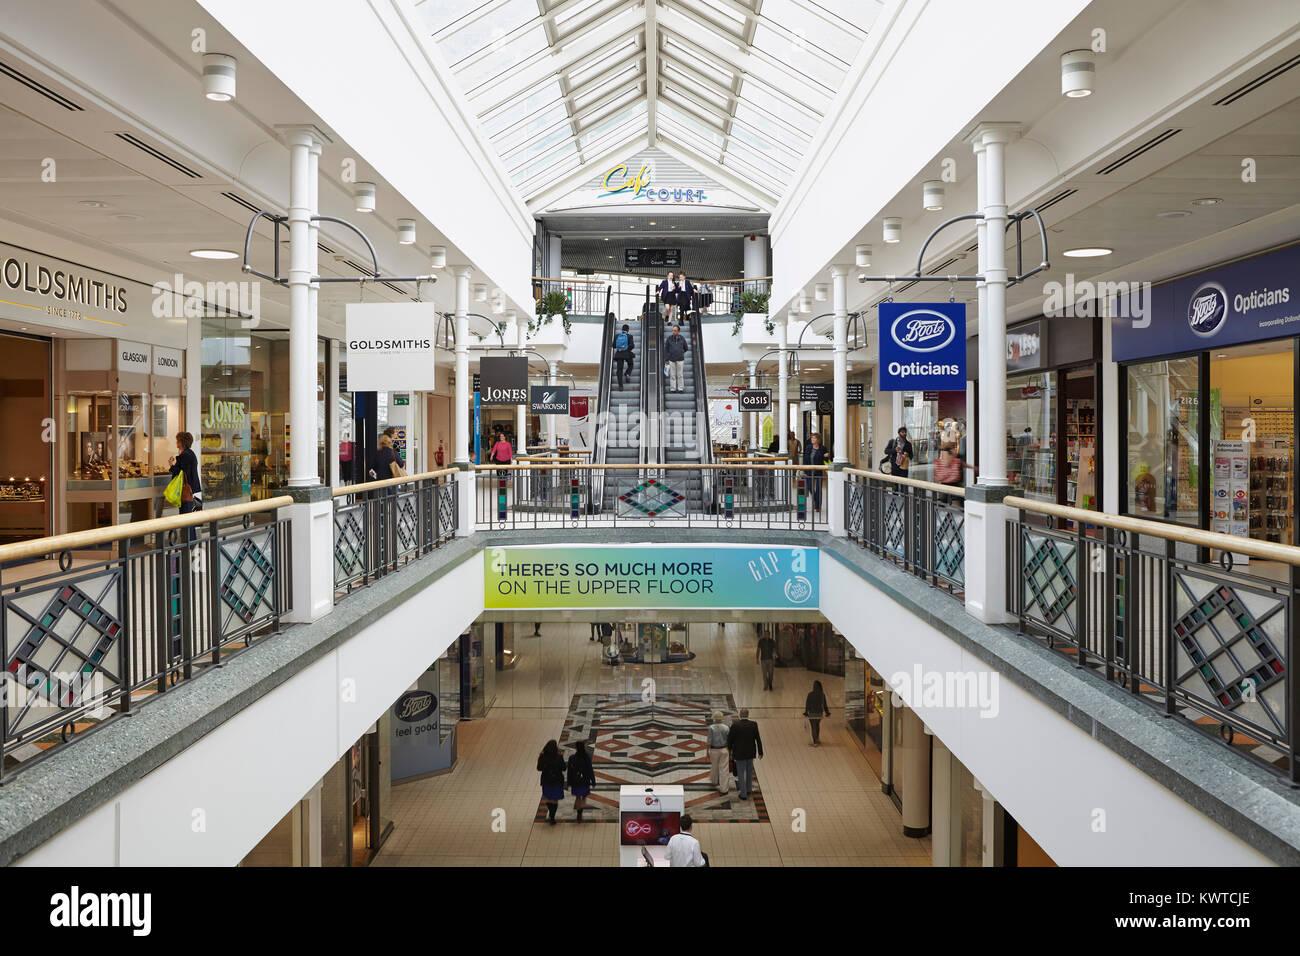 Centre Court Shopping Centre Wimbledon London, UK - Stock Image